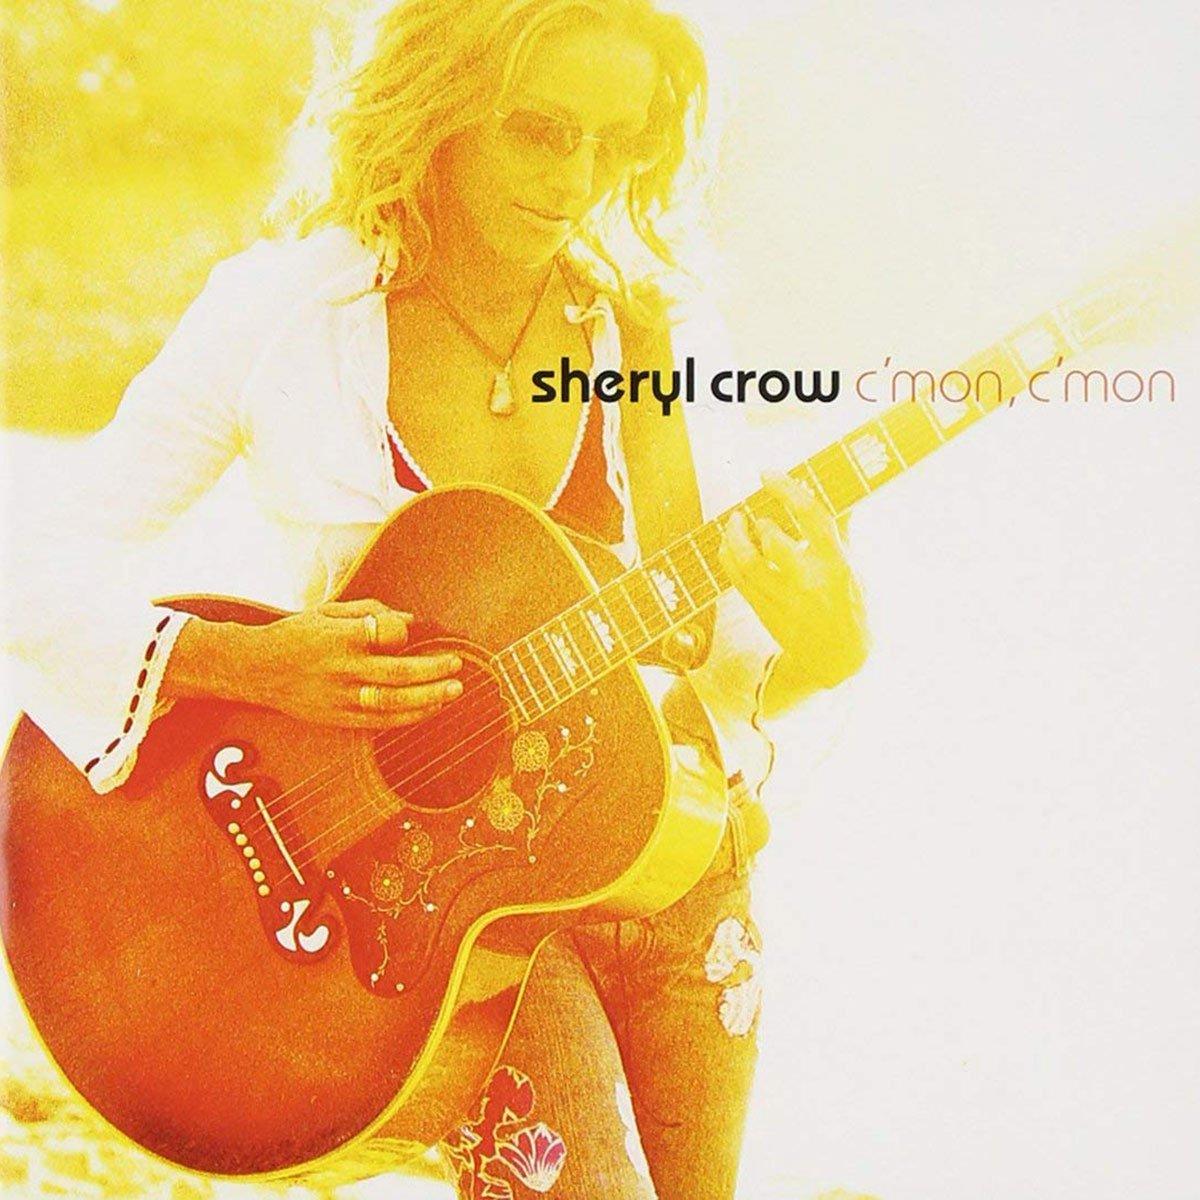 Sheryl Crow, C'mon, C'mon